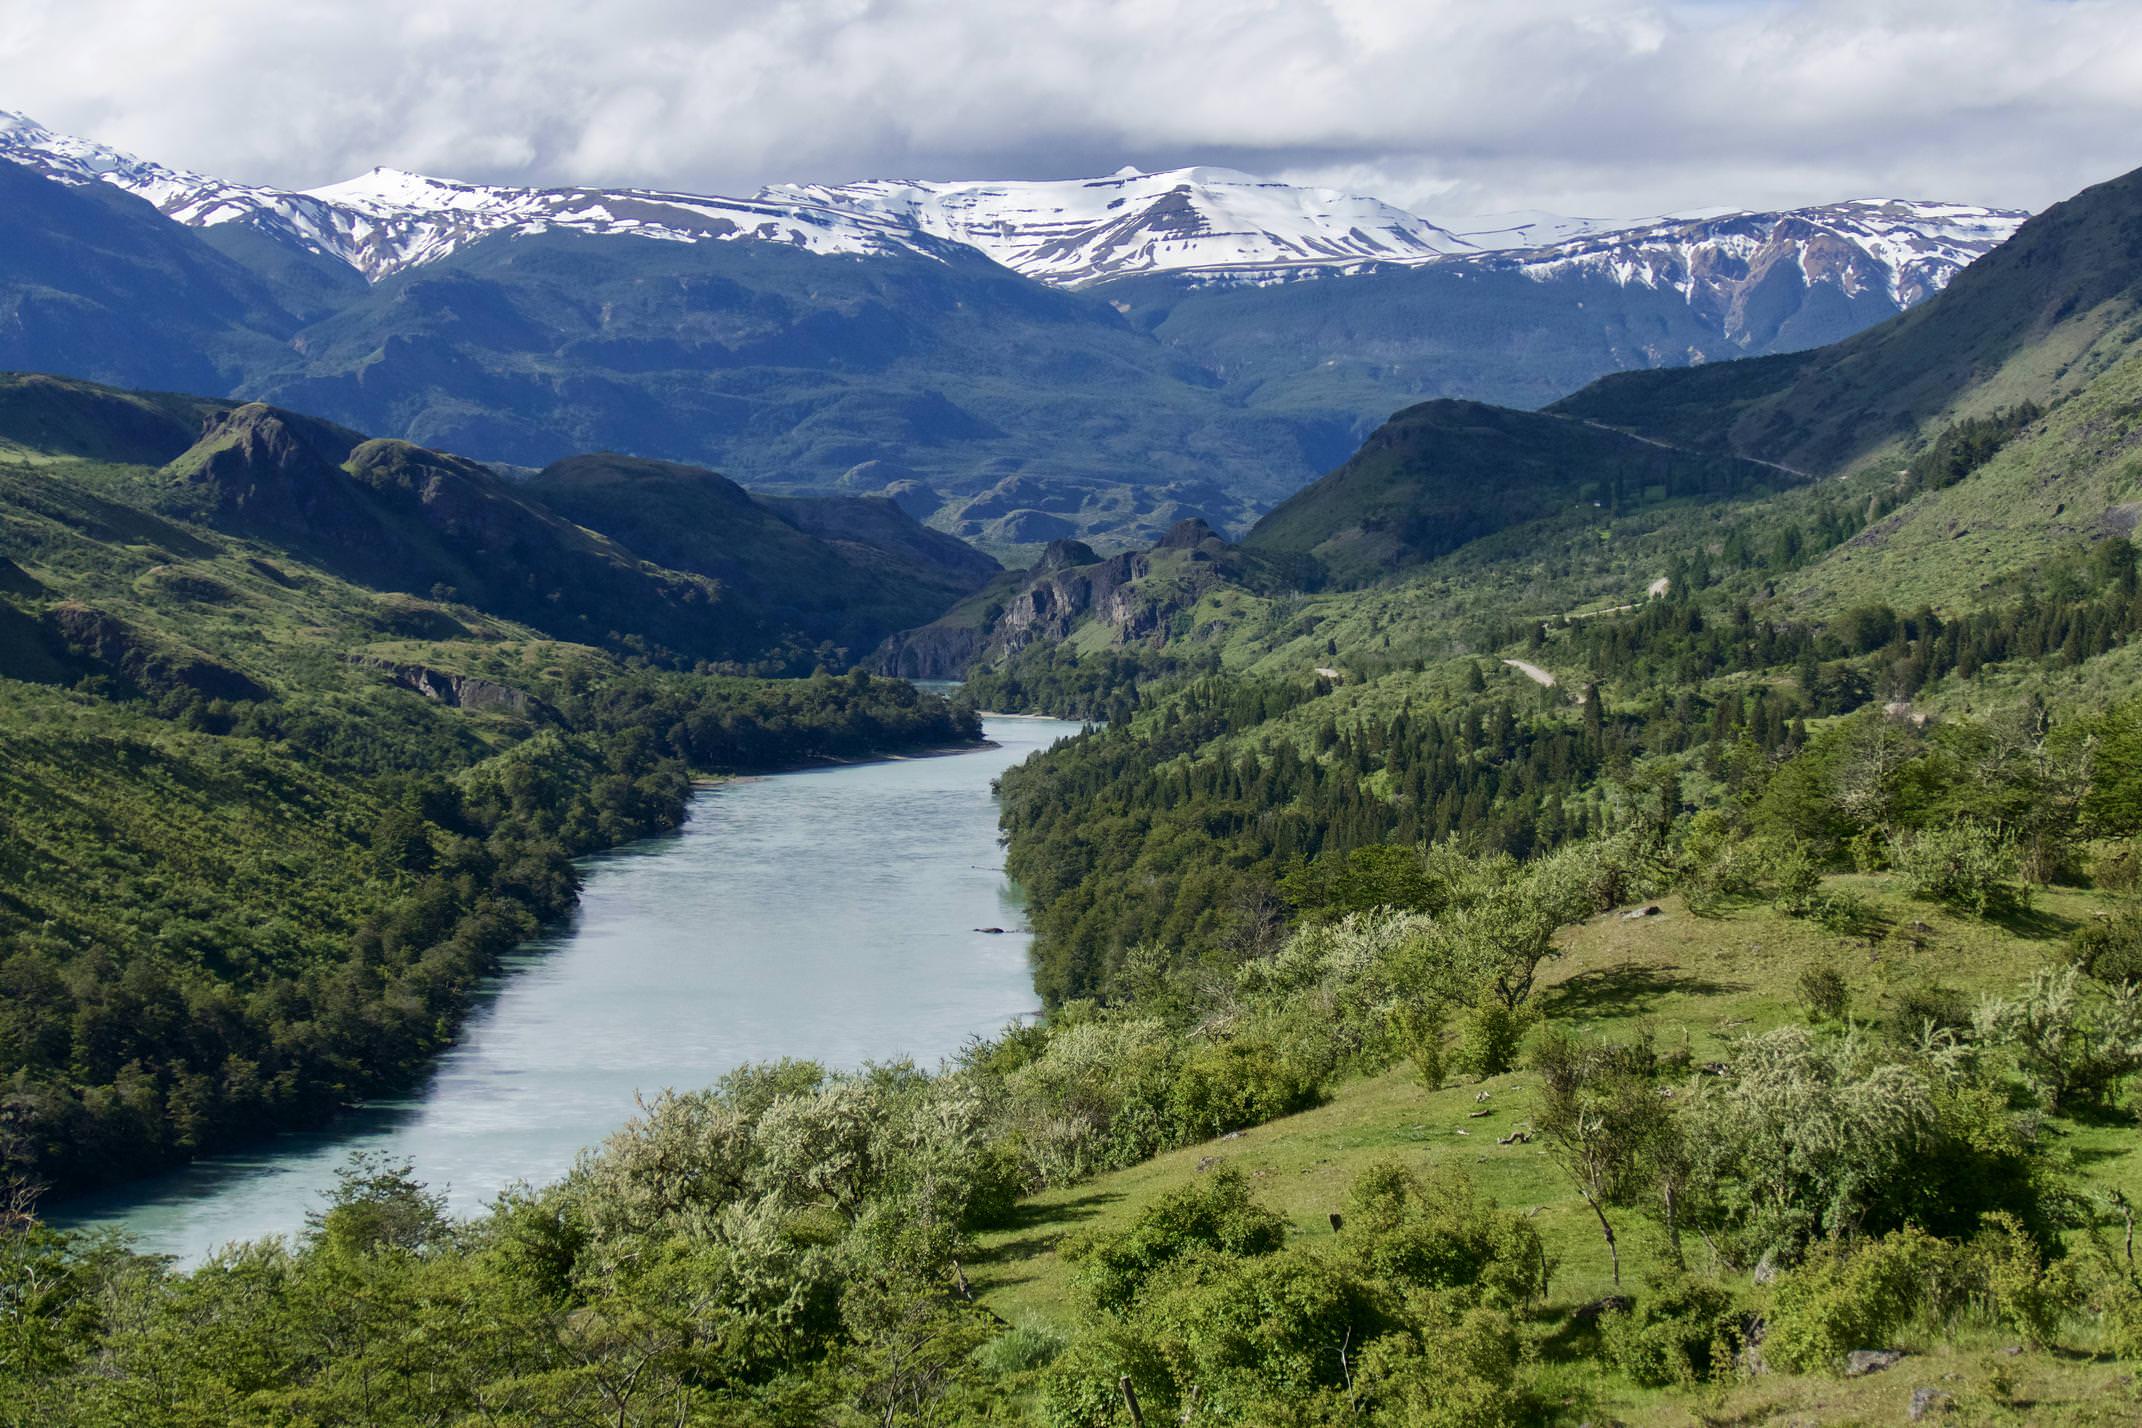 Chile patagonia carretera austral approaching cochrane